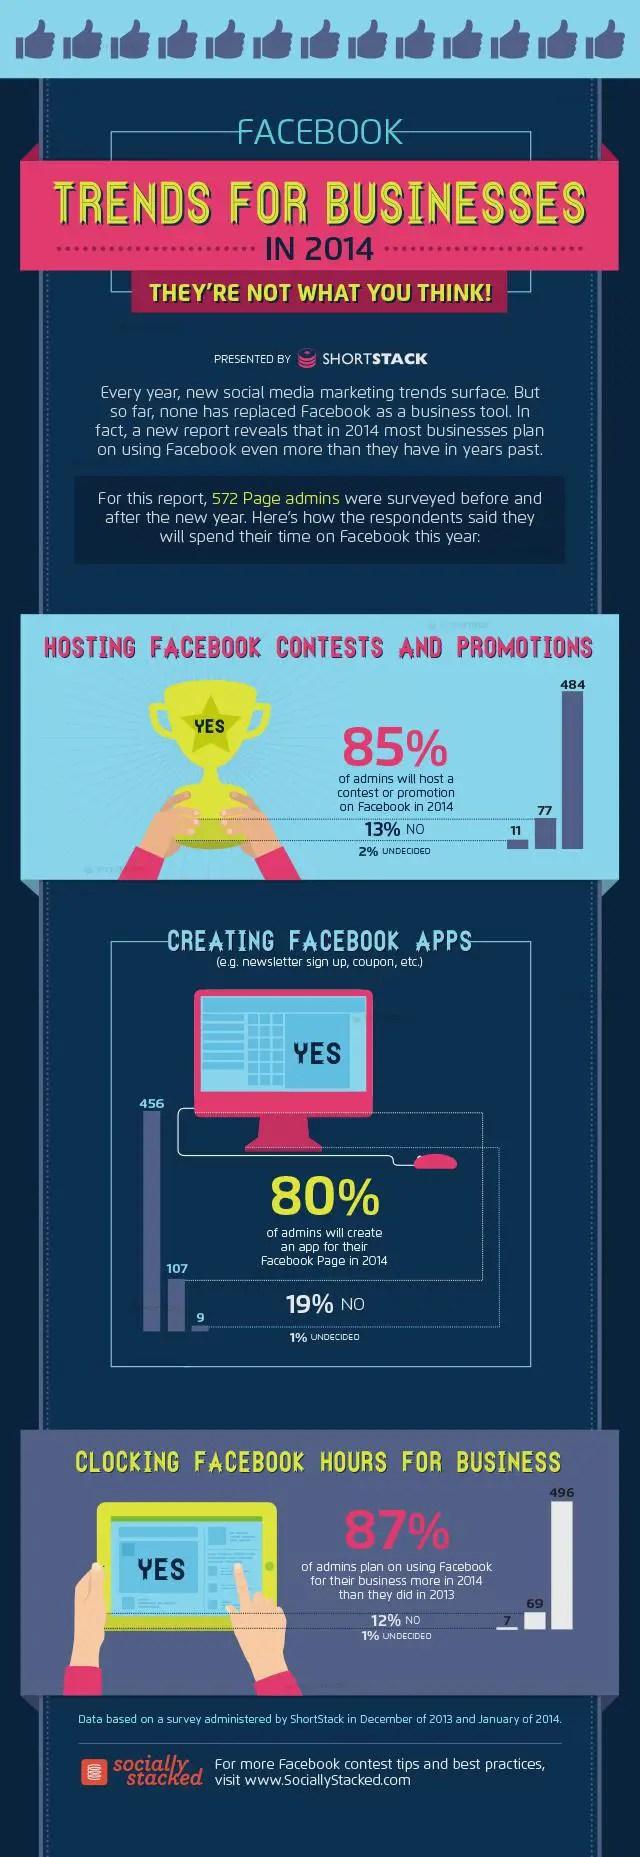 wersm_facebook_business_trends_2014